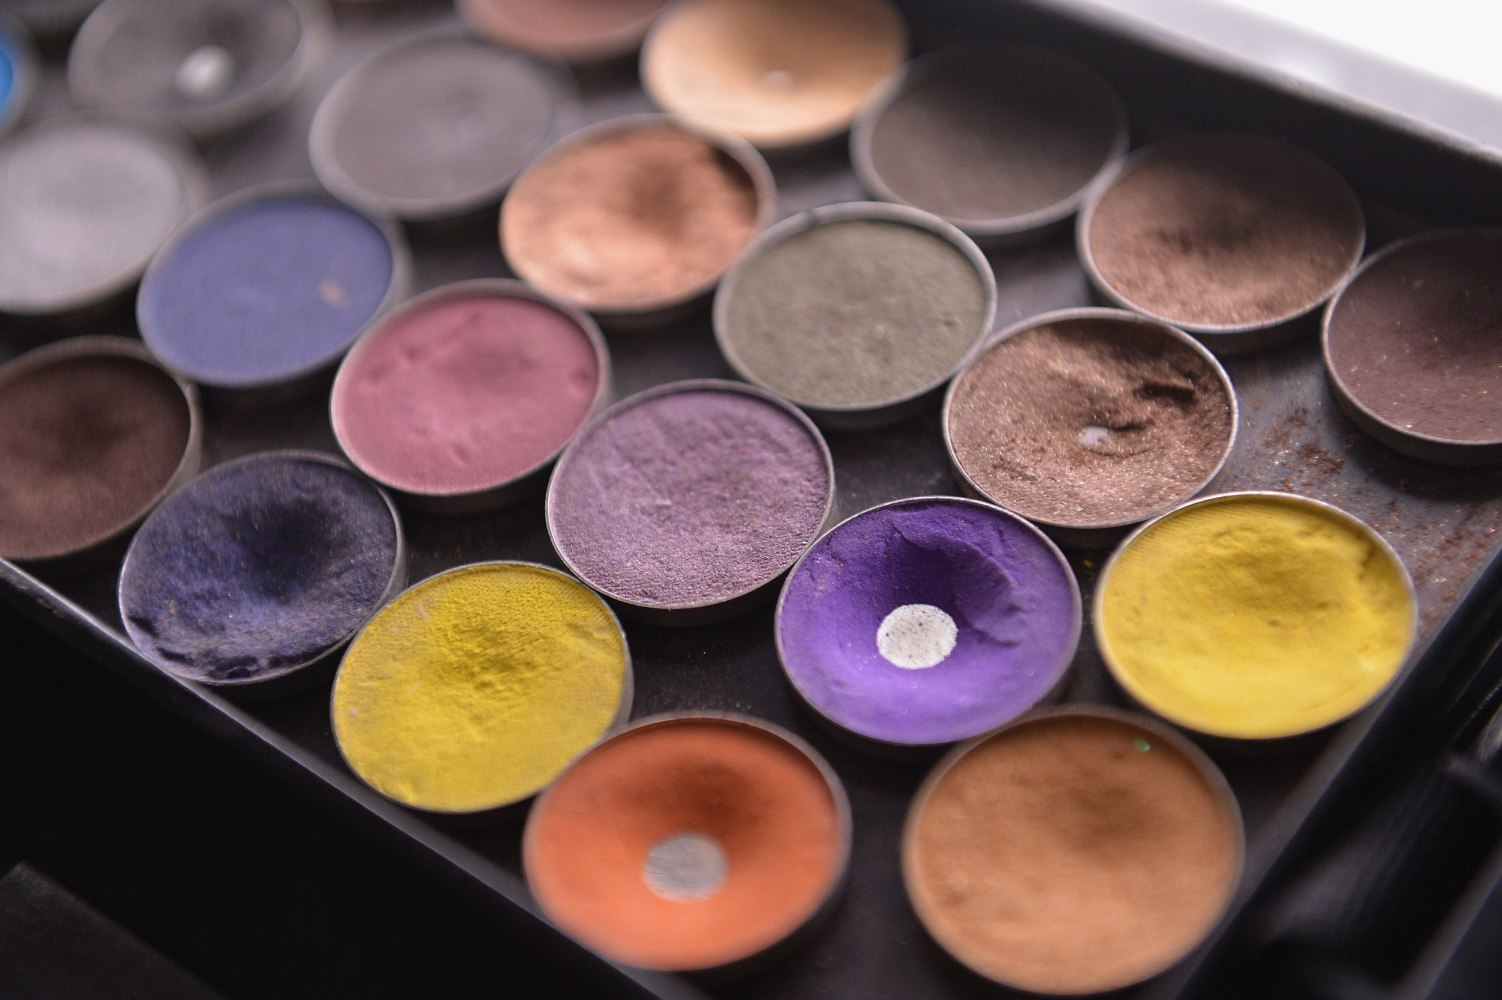 LAPD investigating theft of $4.5m worth of Modern Renaissance eyeshadow